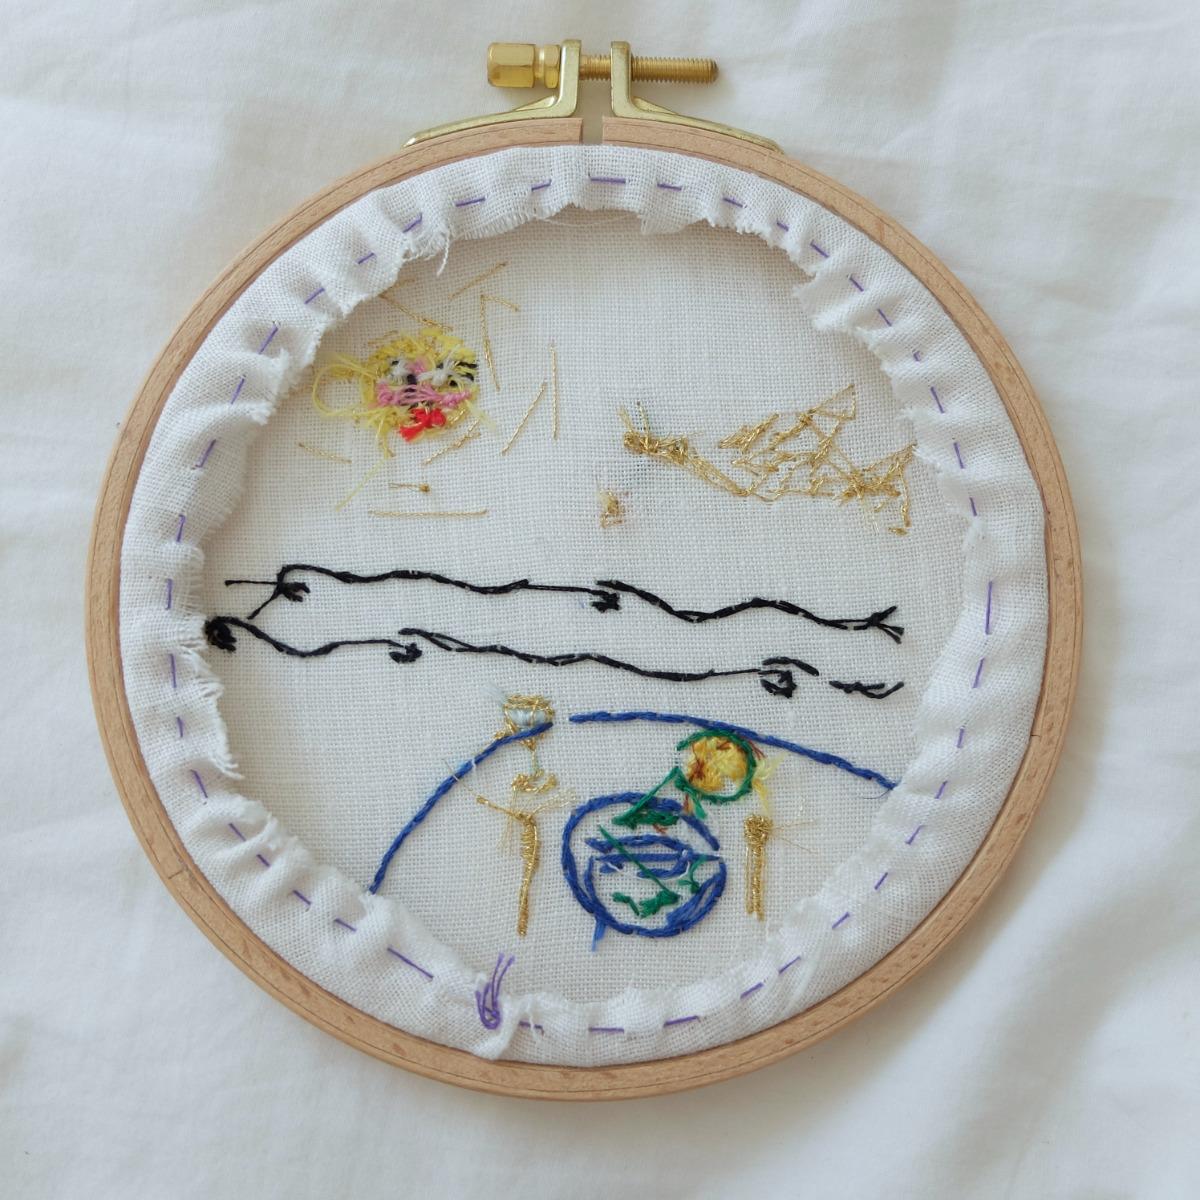 Life in the atlantique hoop backside